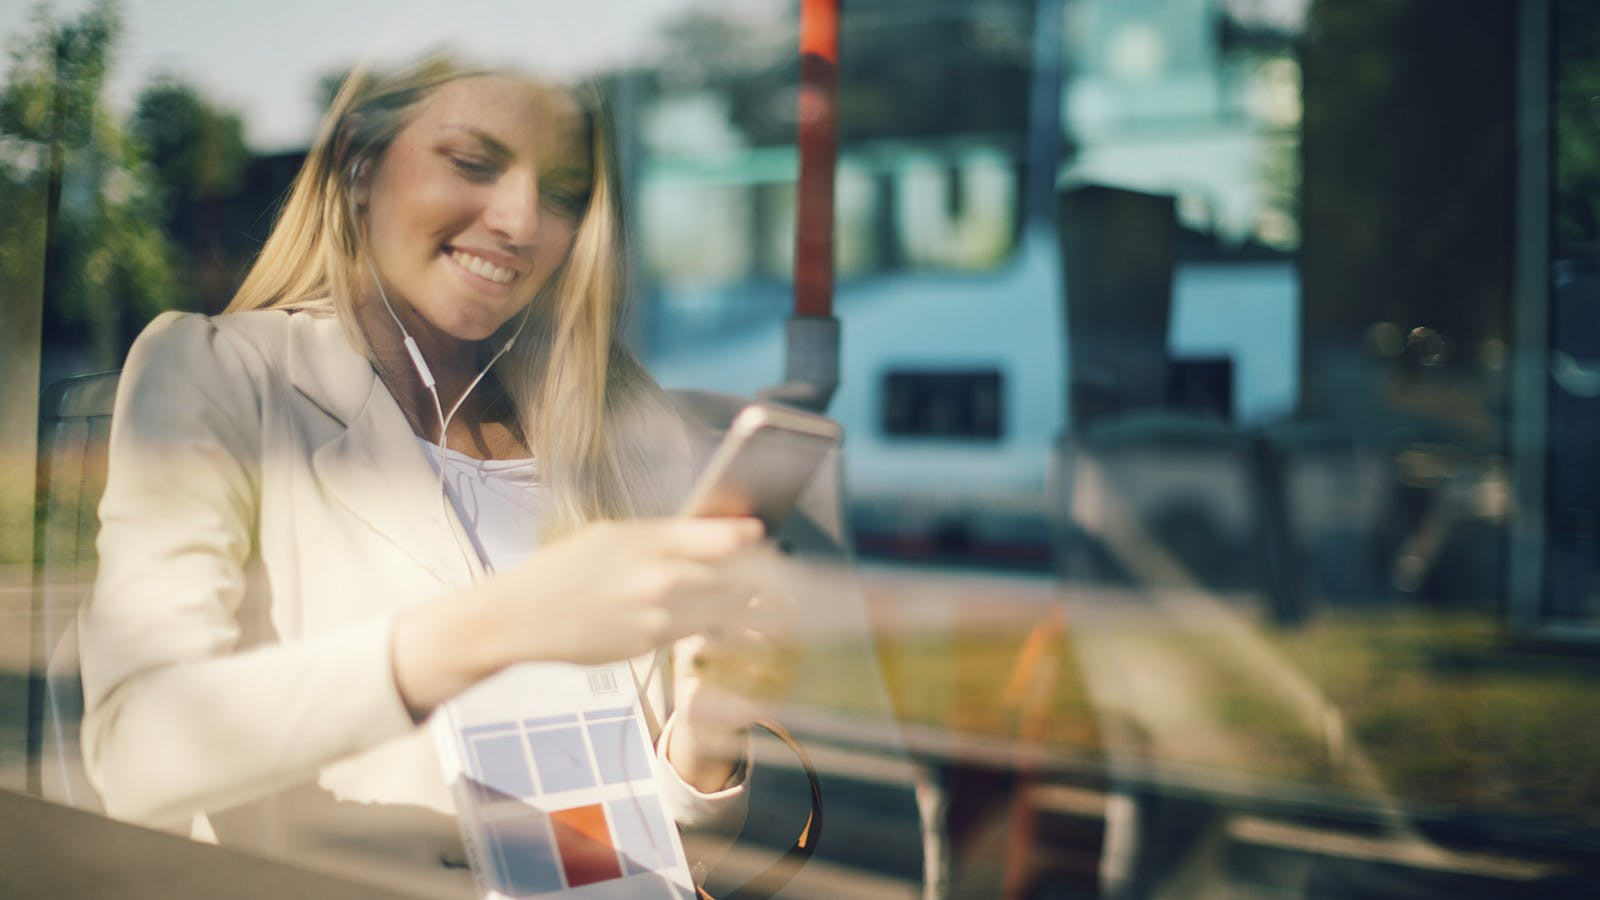 Is My Dating Relationship Idolatrous? | Desiring God